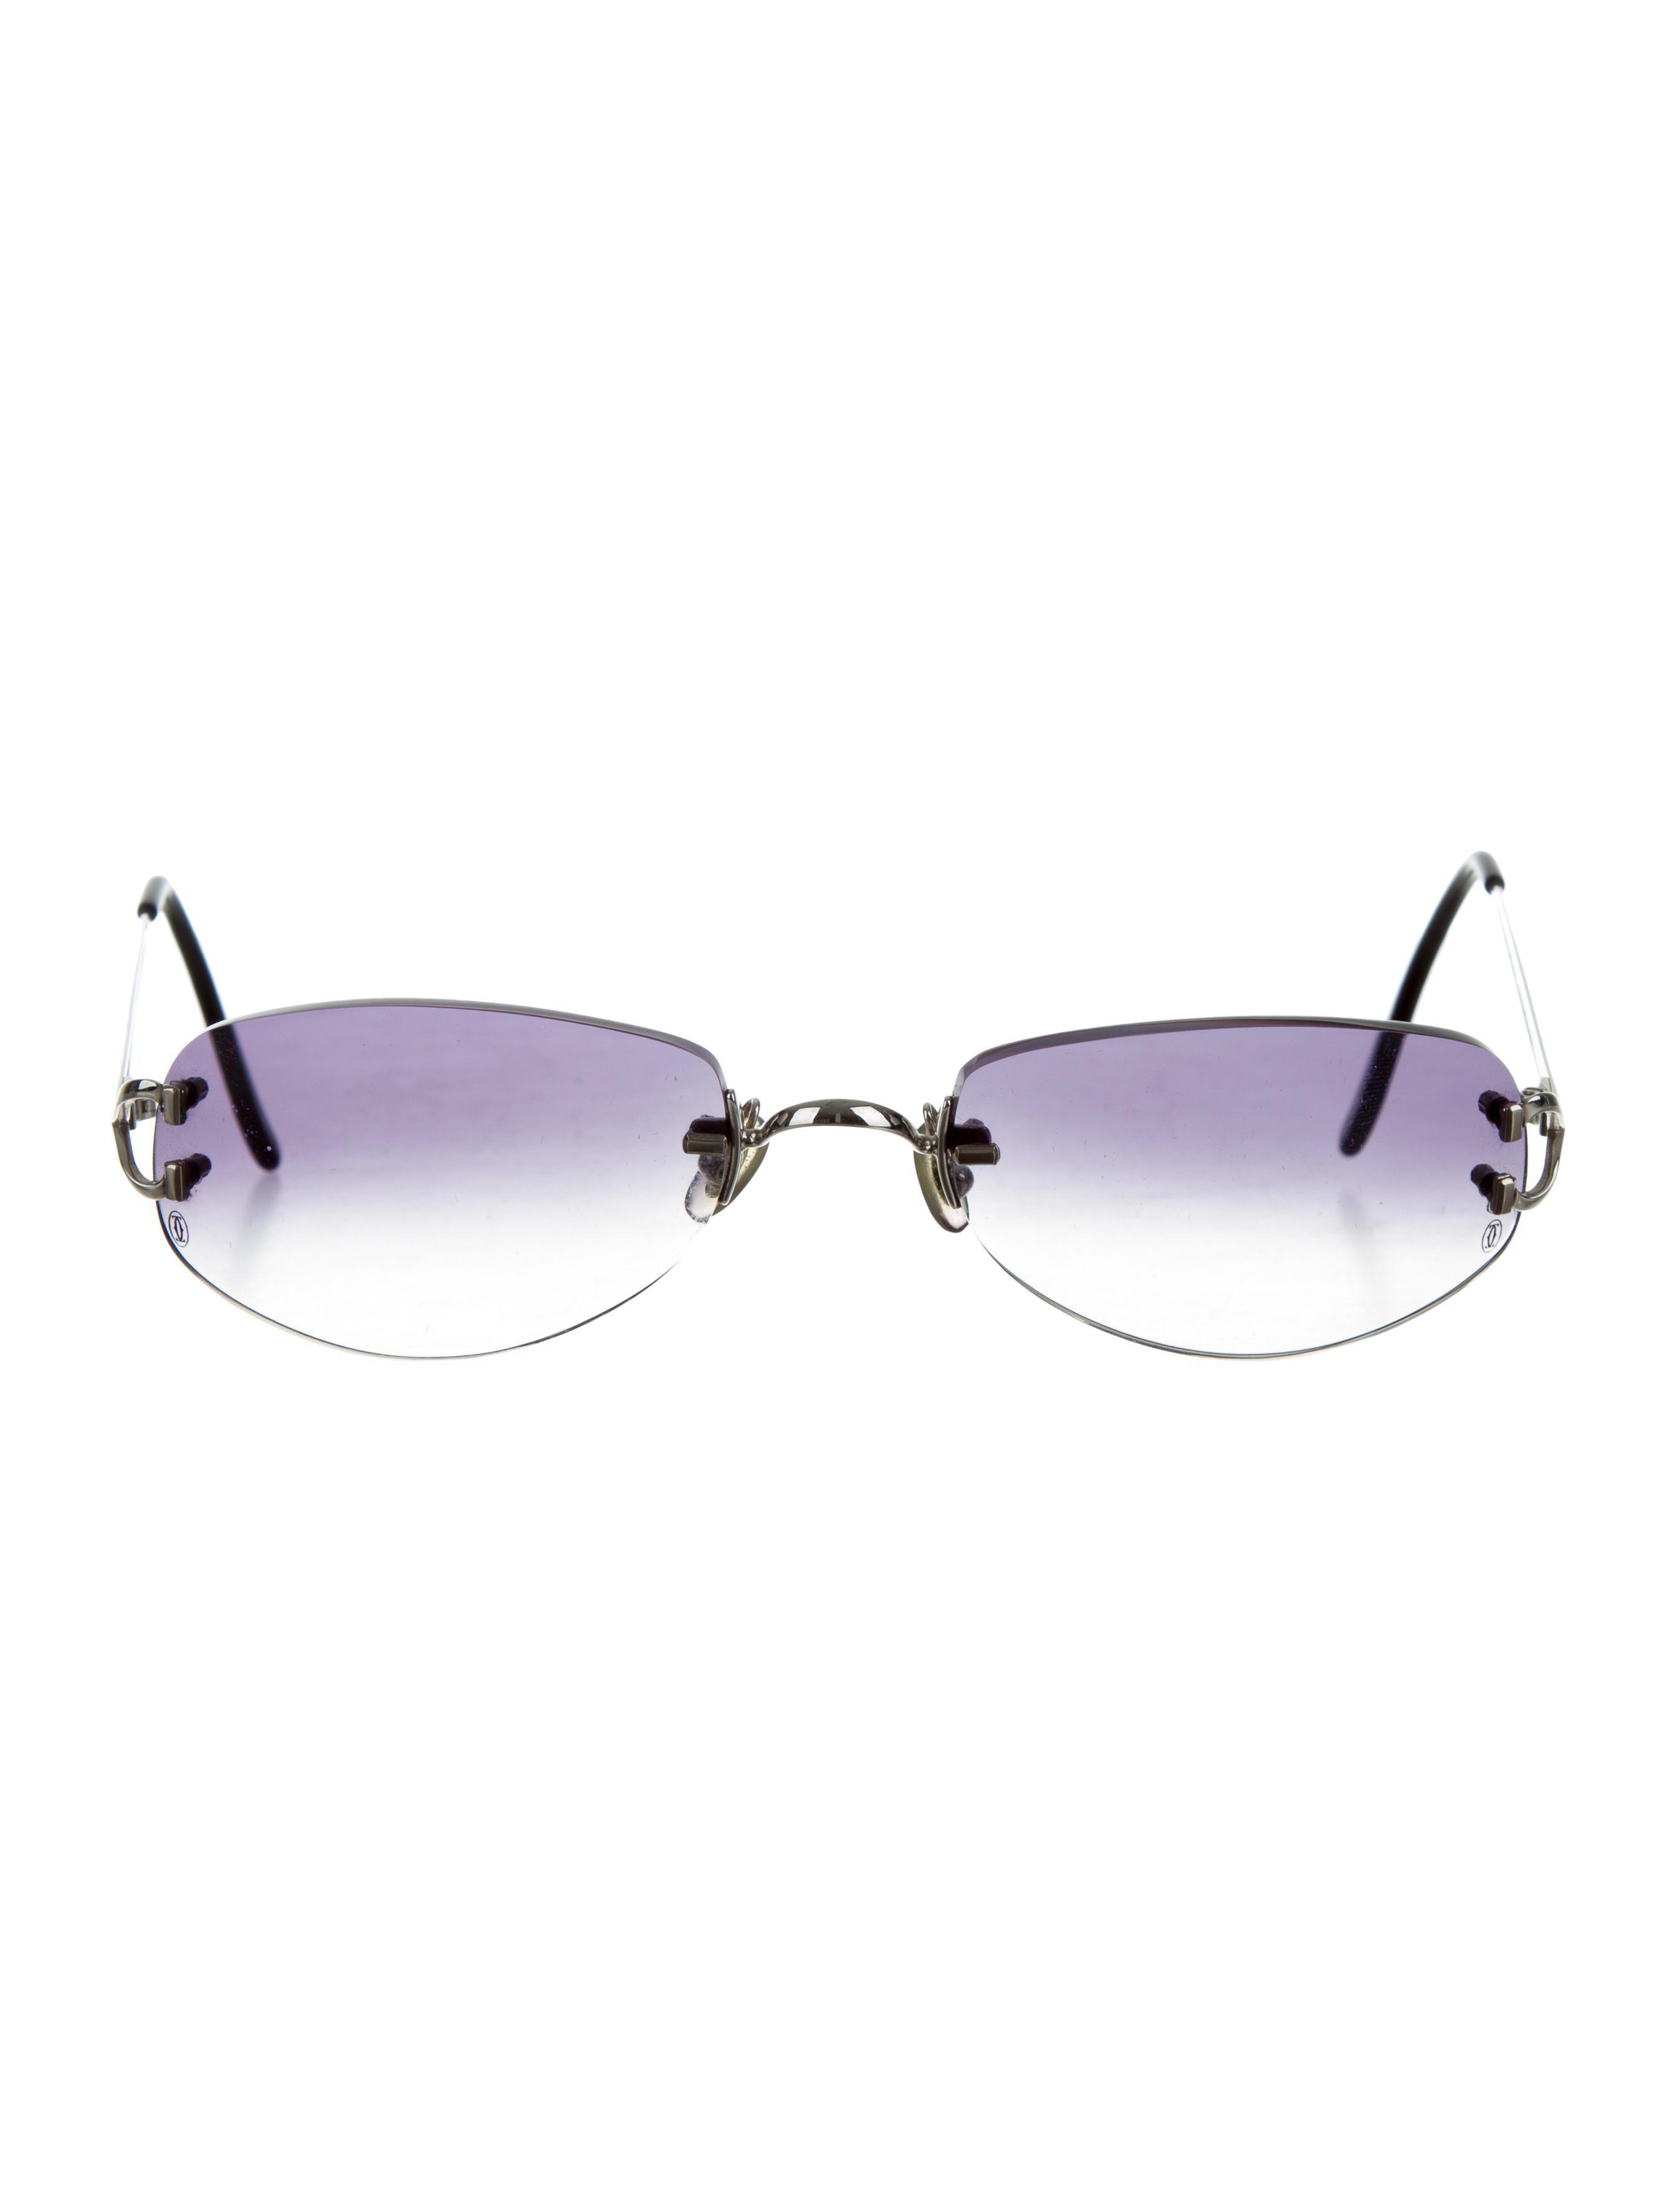 076d77e0c85 Lyst - Cartier Rimless Graident Sunglasses Silver in Metallic for Men